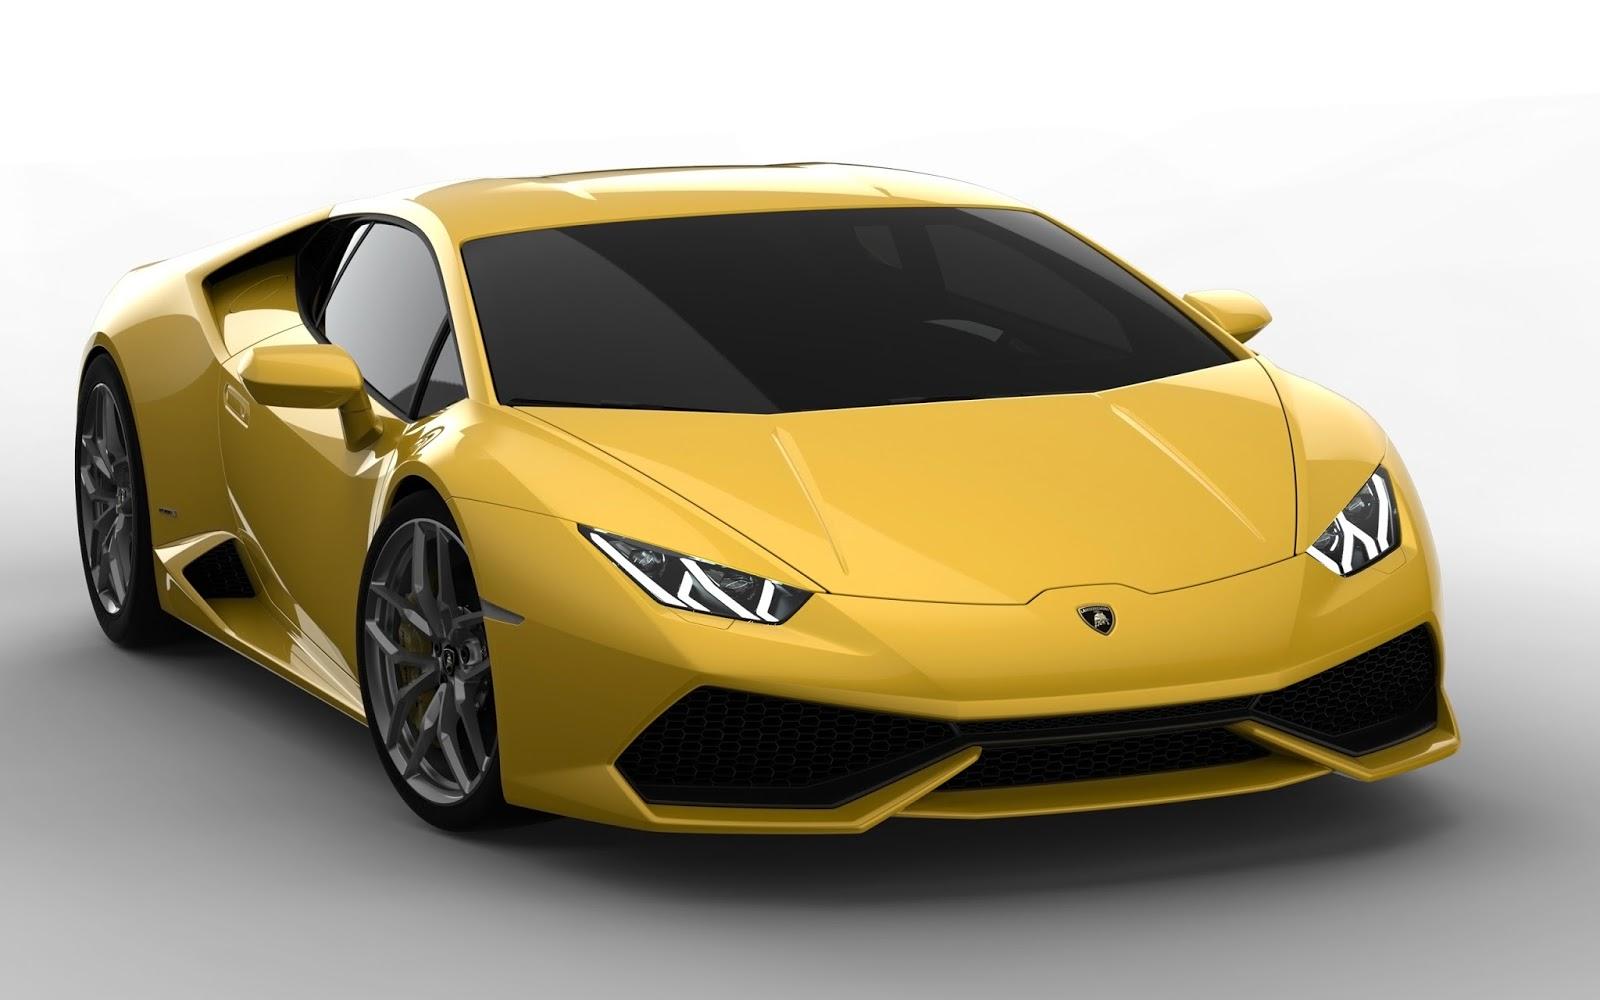 2016 Lamborghini Hd  Widescreen Images